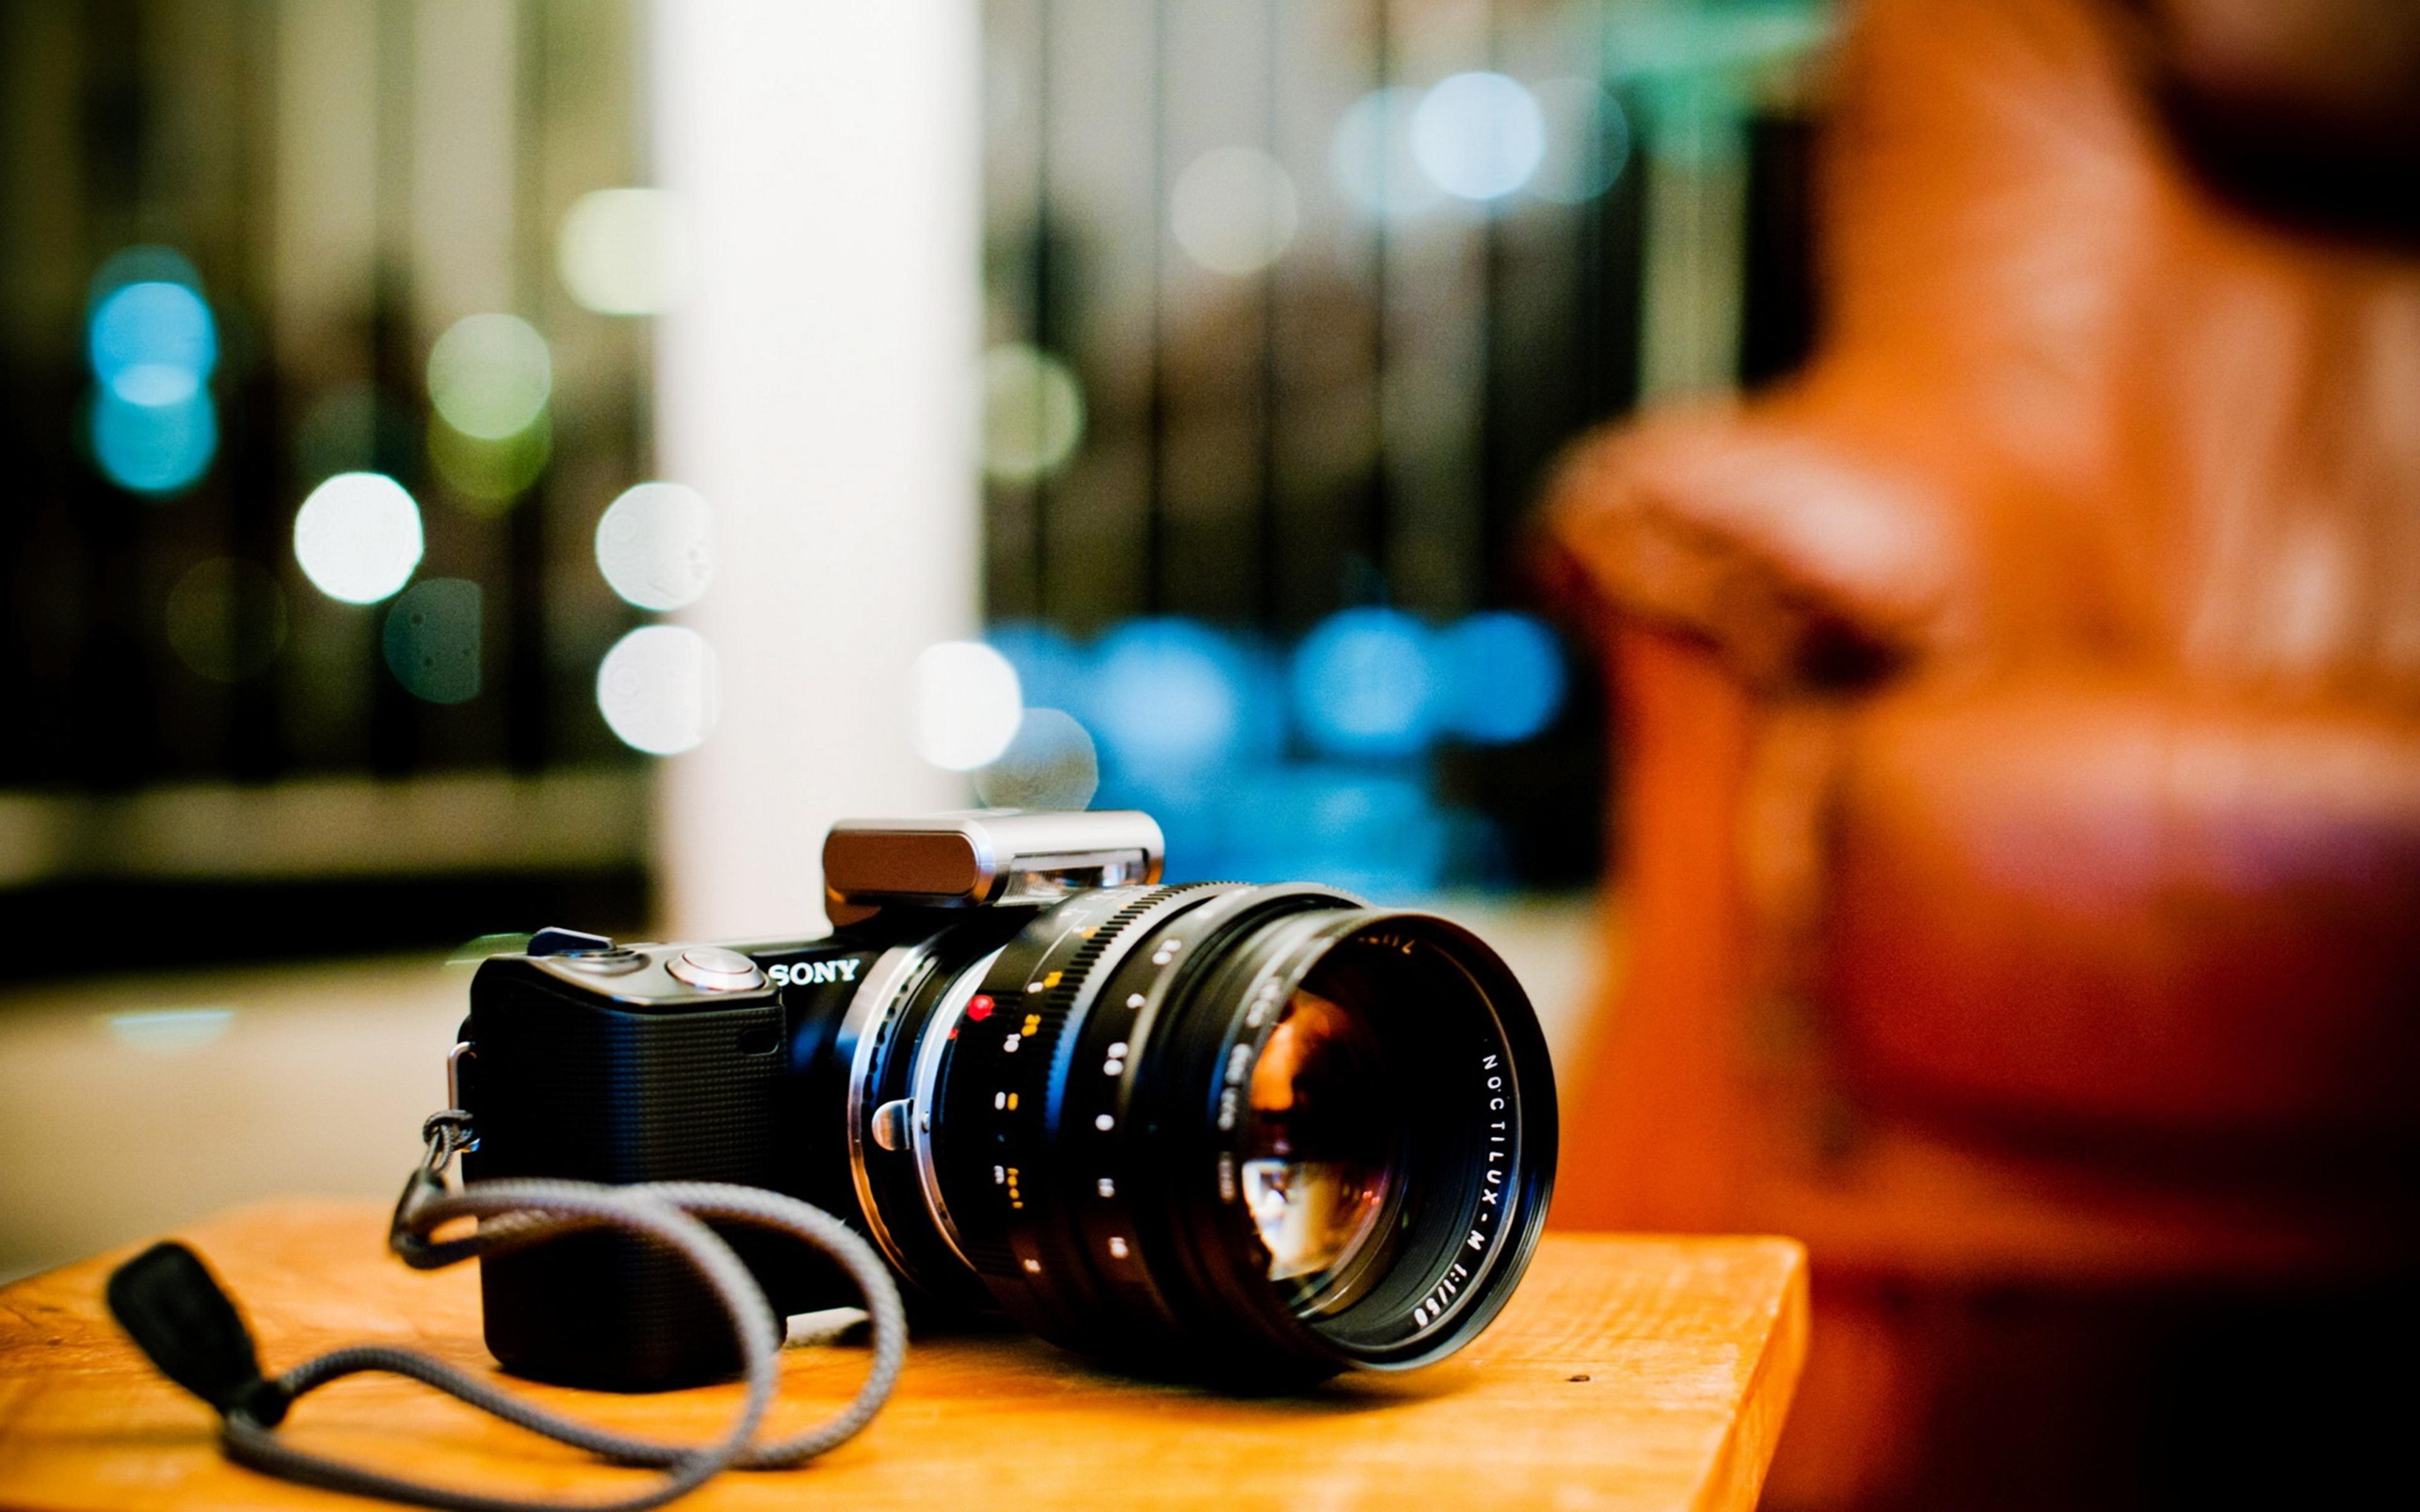 Camera Sony 4k Ultra Hd Wallpaper Background Image 3840x2400